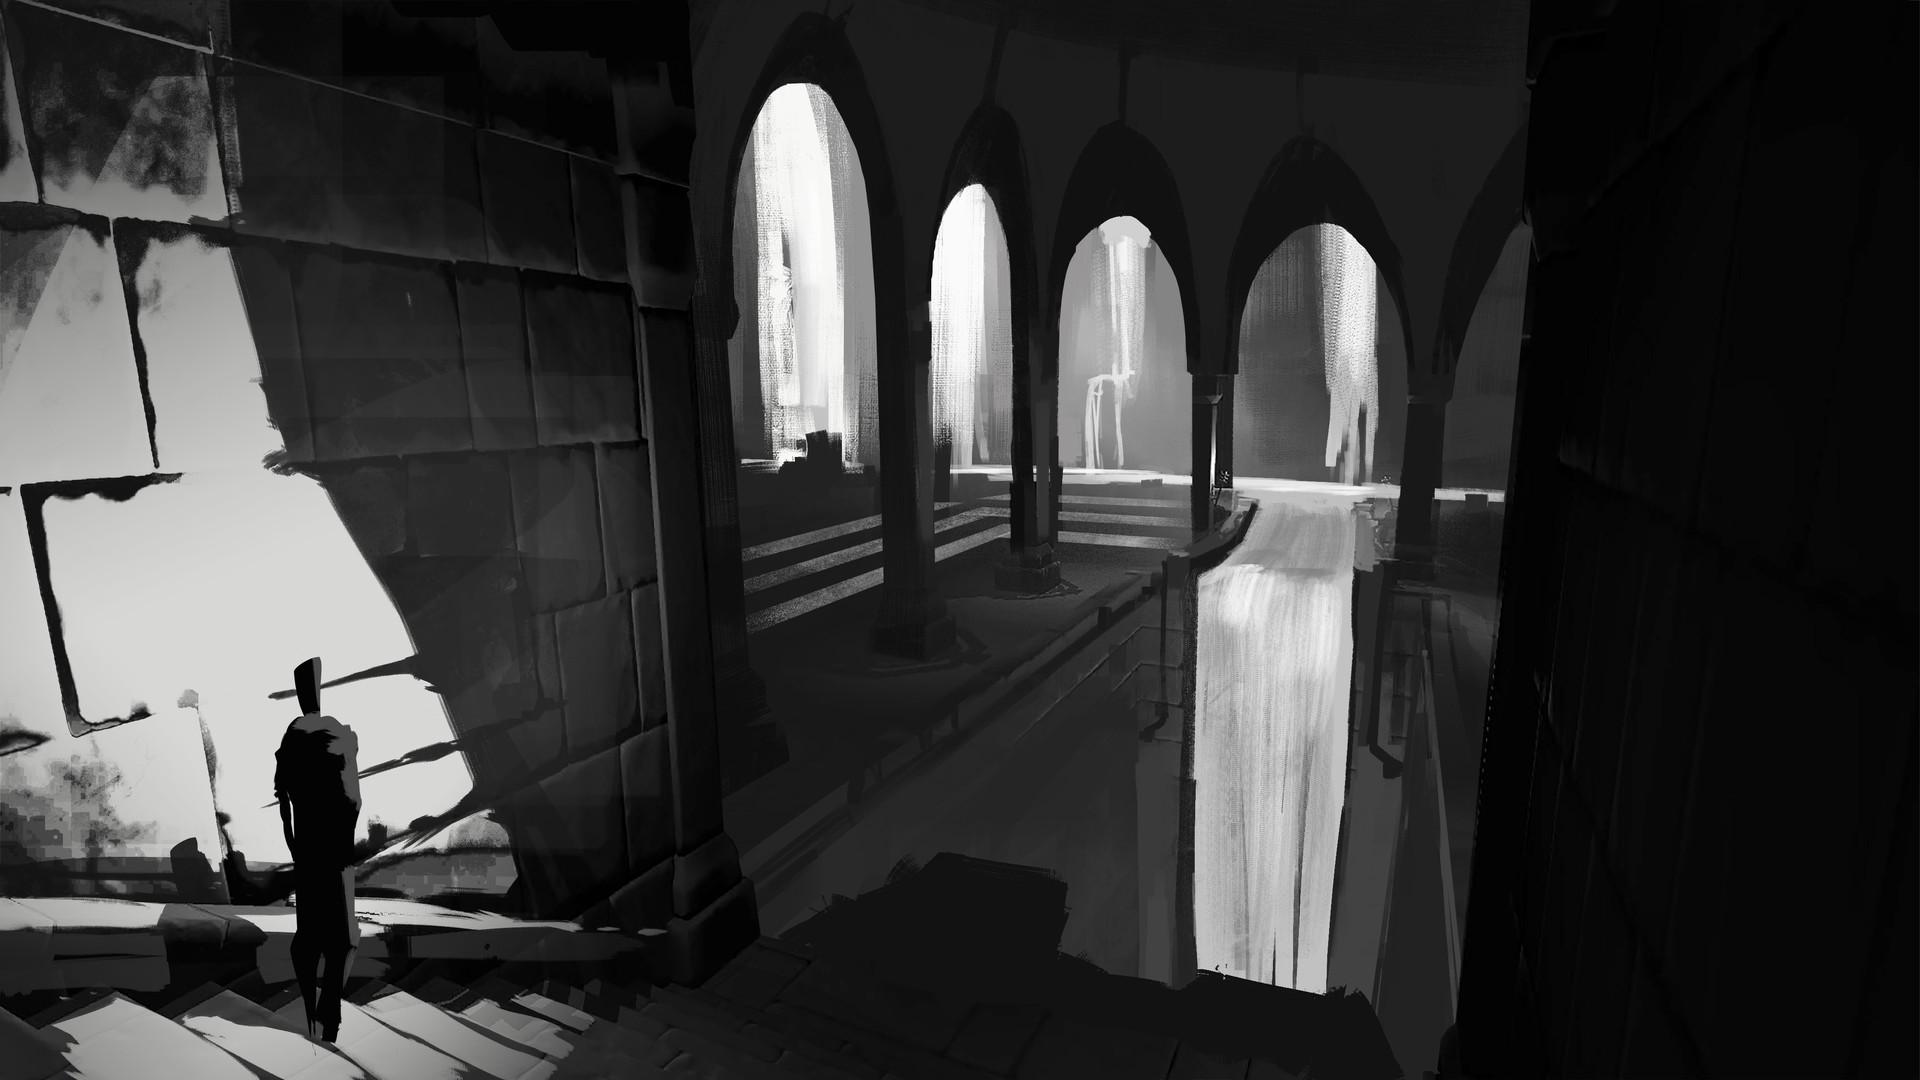 Grady frederick dungeon v2 a